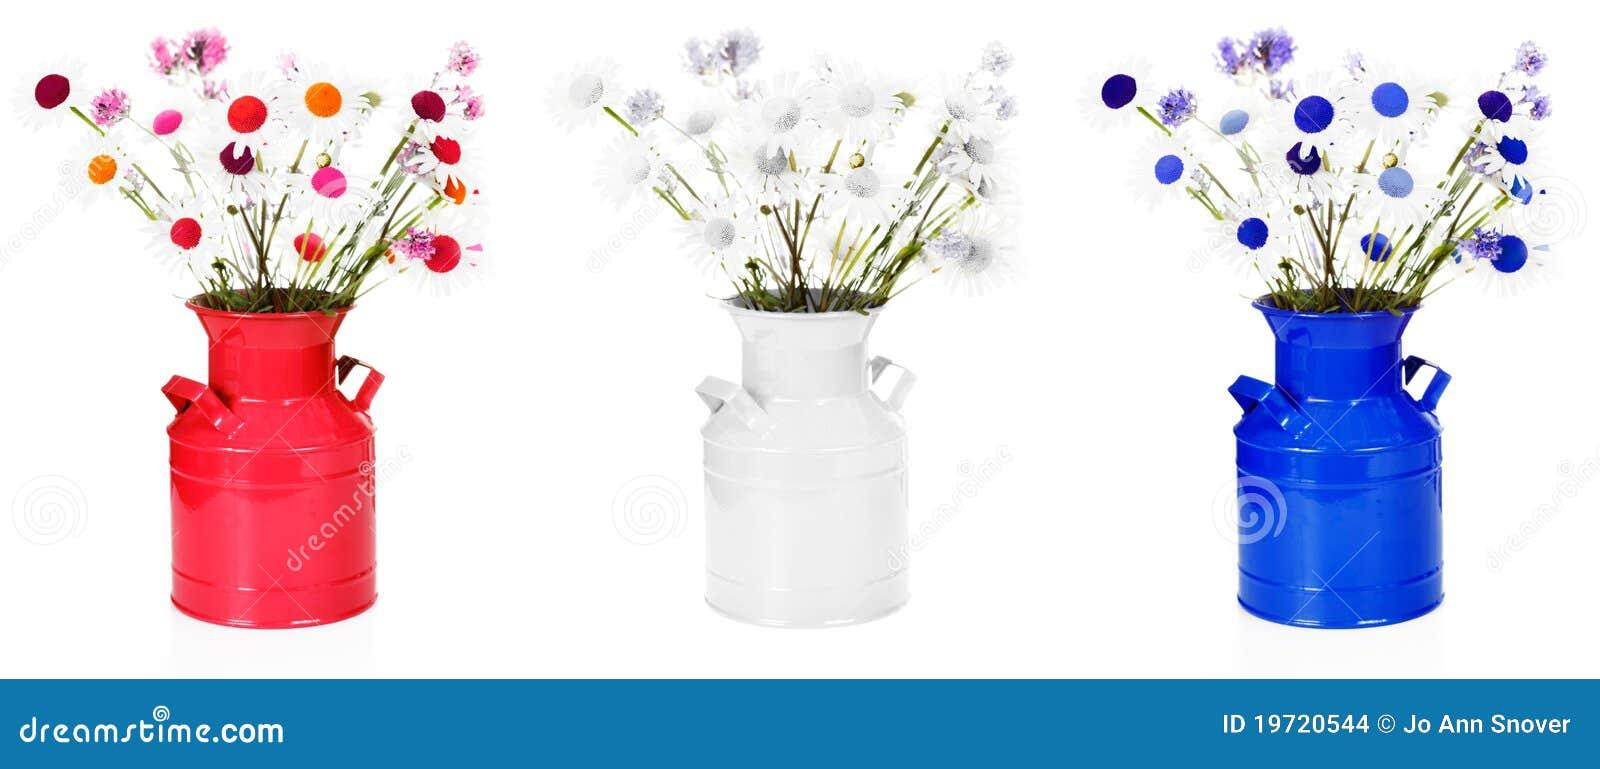 Red white blue flower arrangements stock photo image of oxeye red white blue flower arrangements mightylinksfo